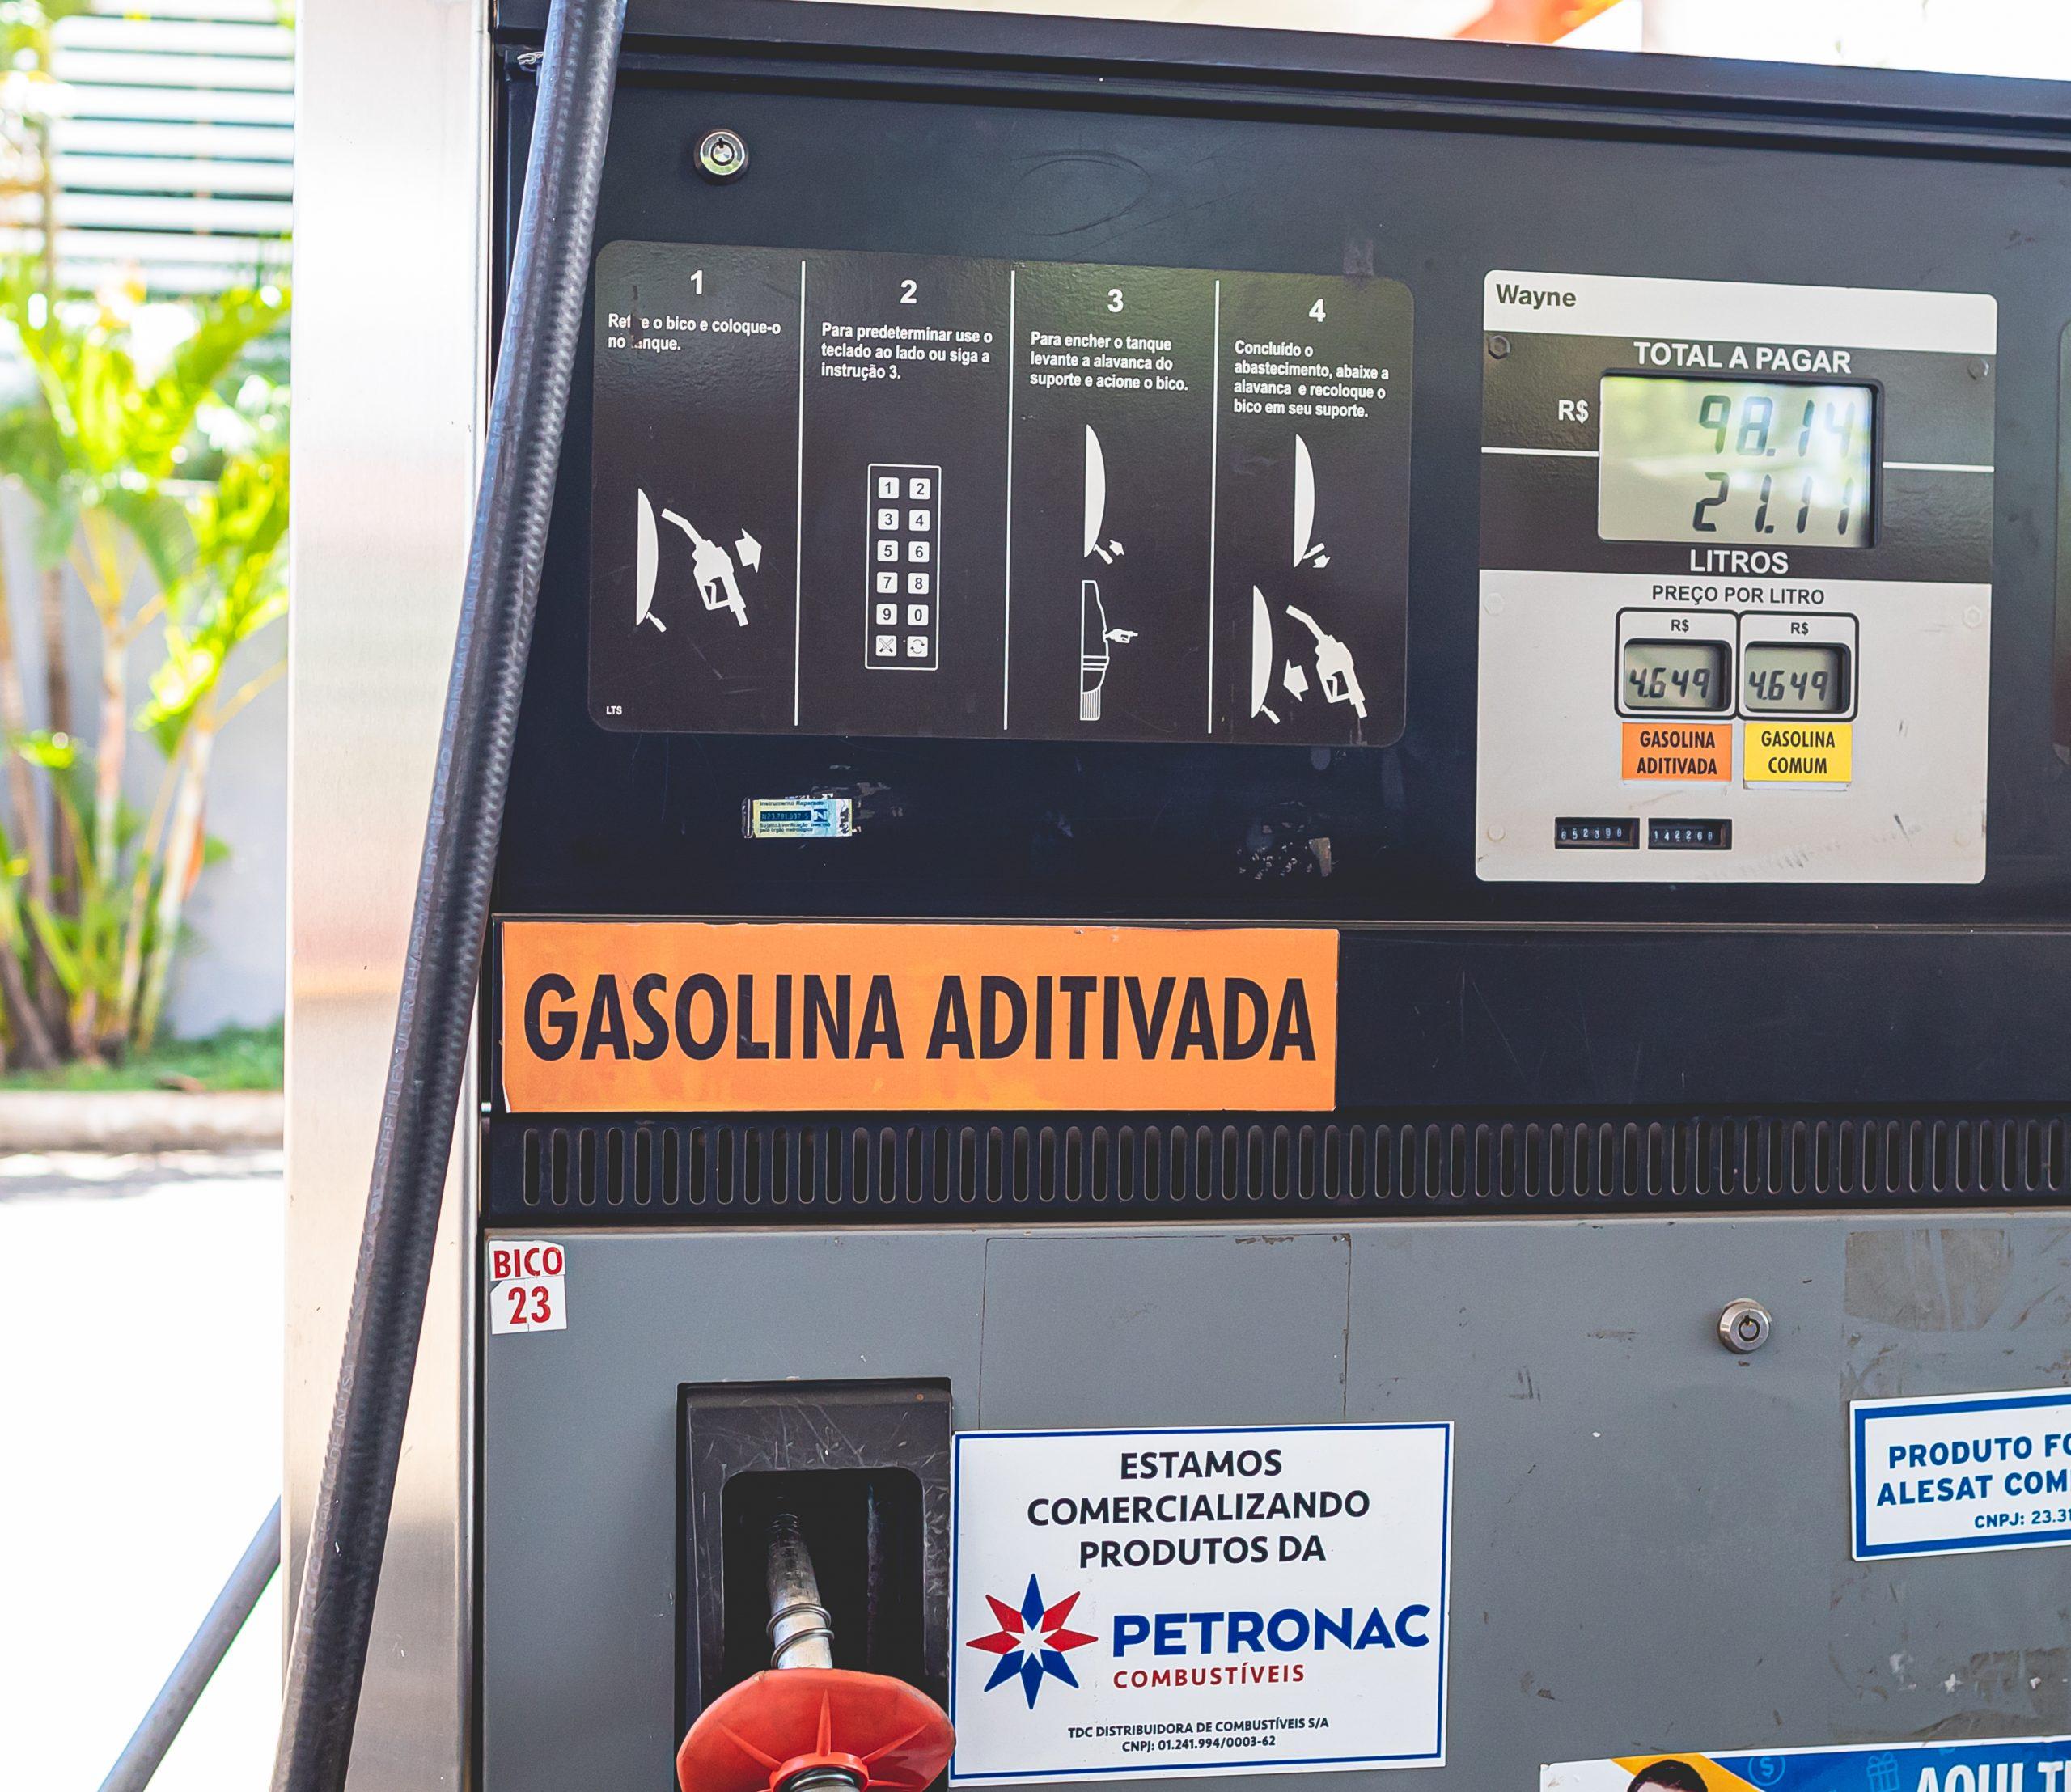 gasolina aditivada shutterstock